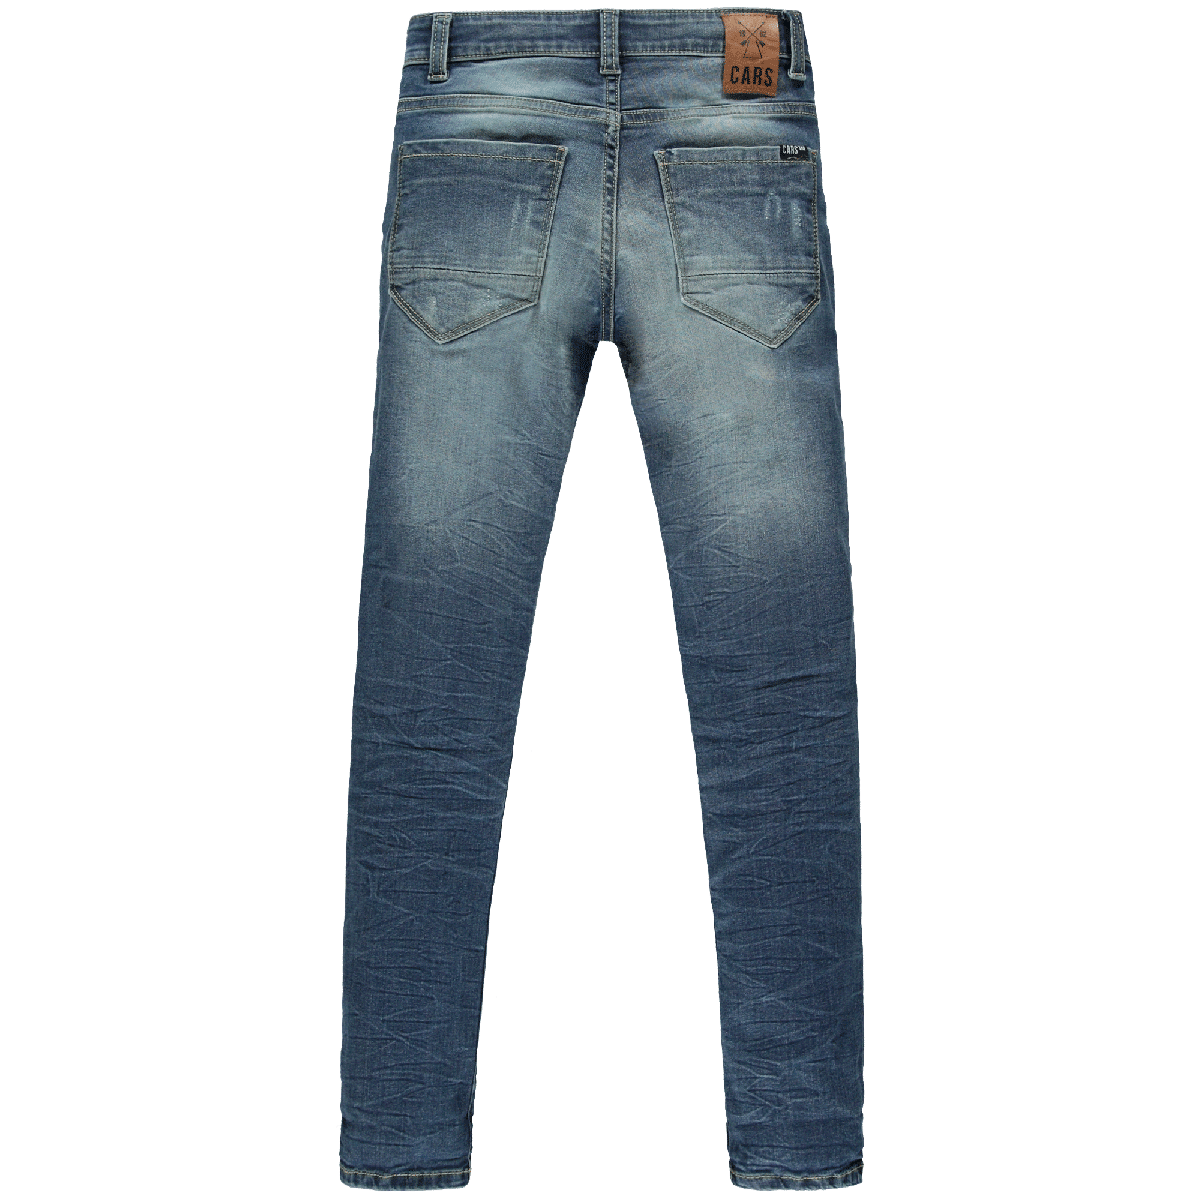 Cars Jeans Bonar Stw used